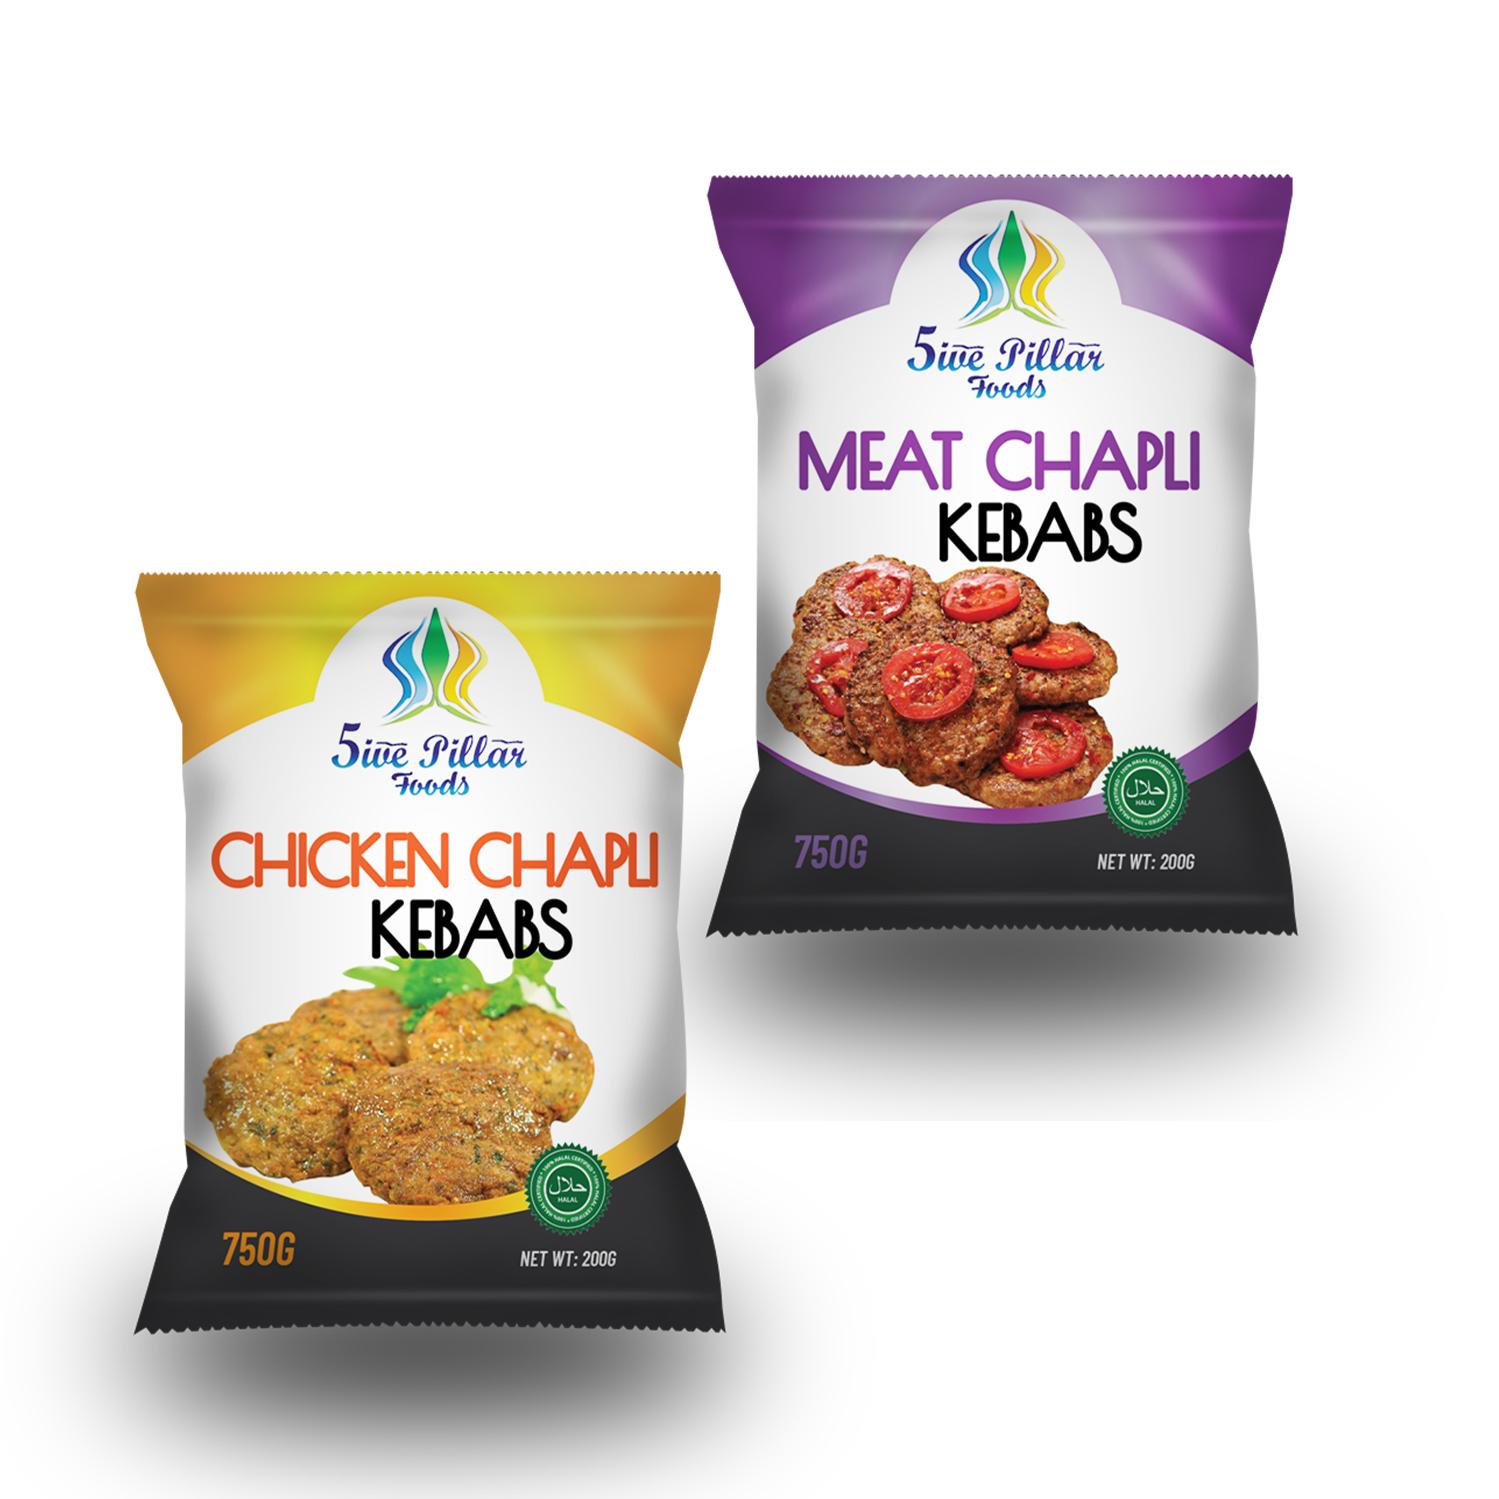 Modern Professional Crowd Packaging Design For Uk Frozen Food